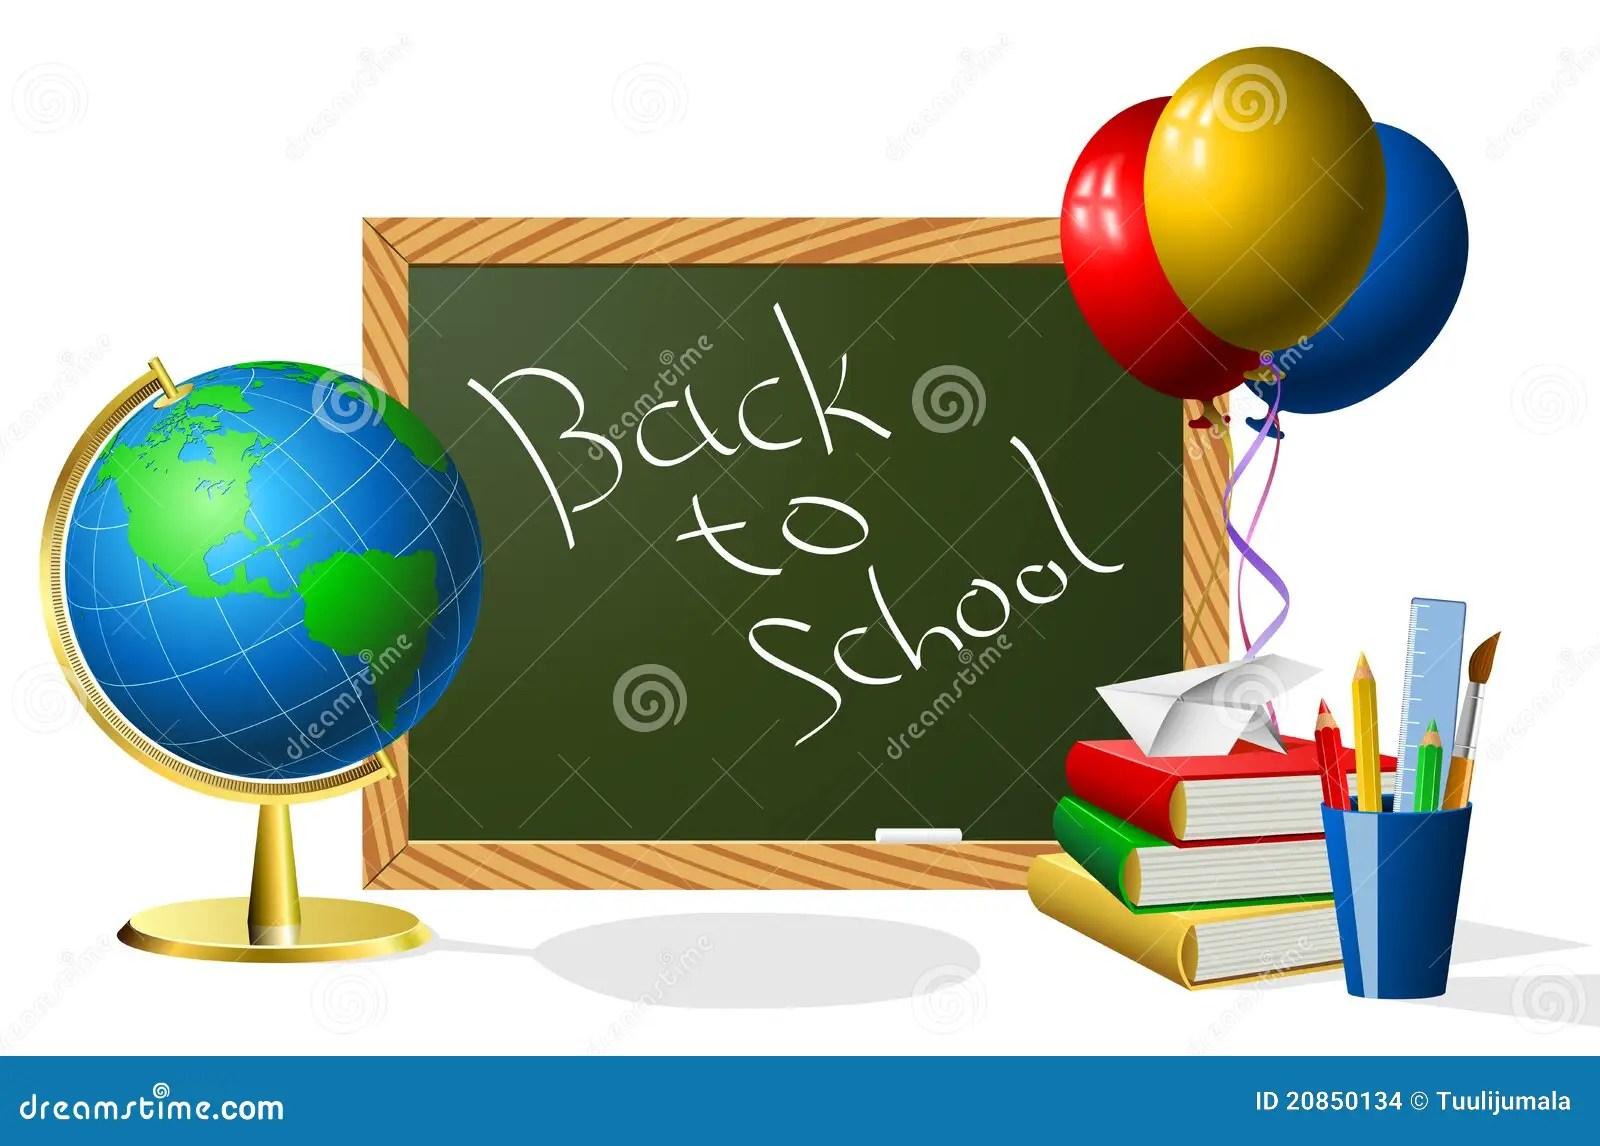 School Year Beginning Stock Images